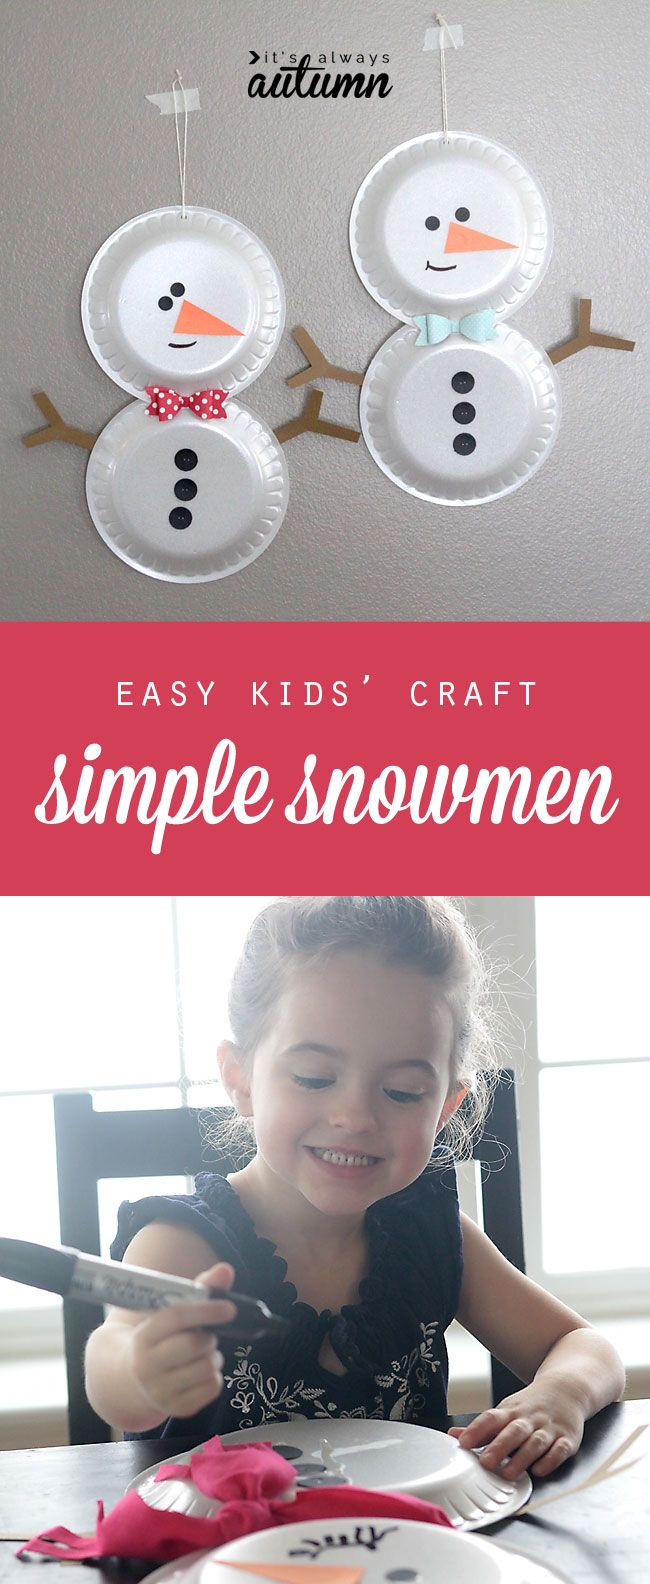 easy holiday kids' craft - foam plate snowmen - looks like fun! #heftyholidays #sp